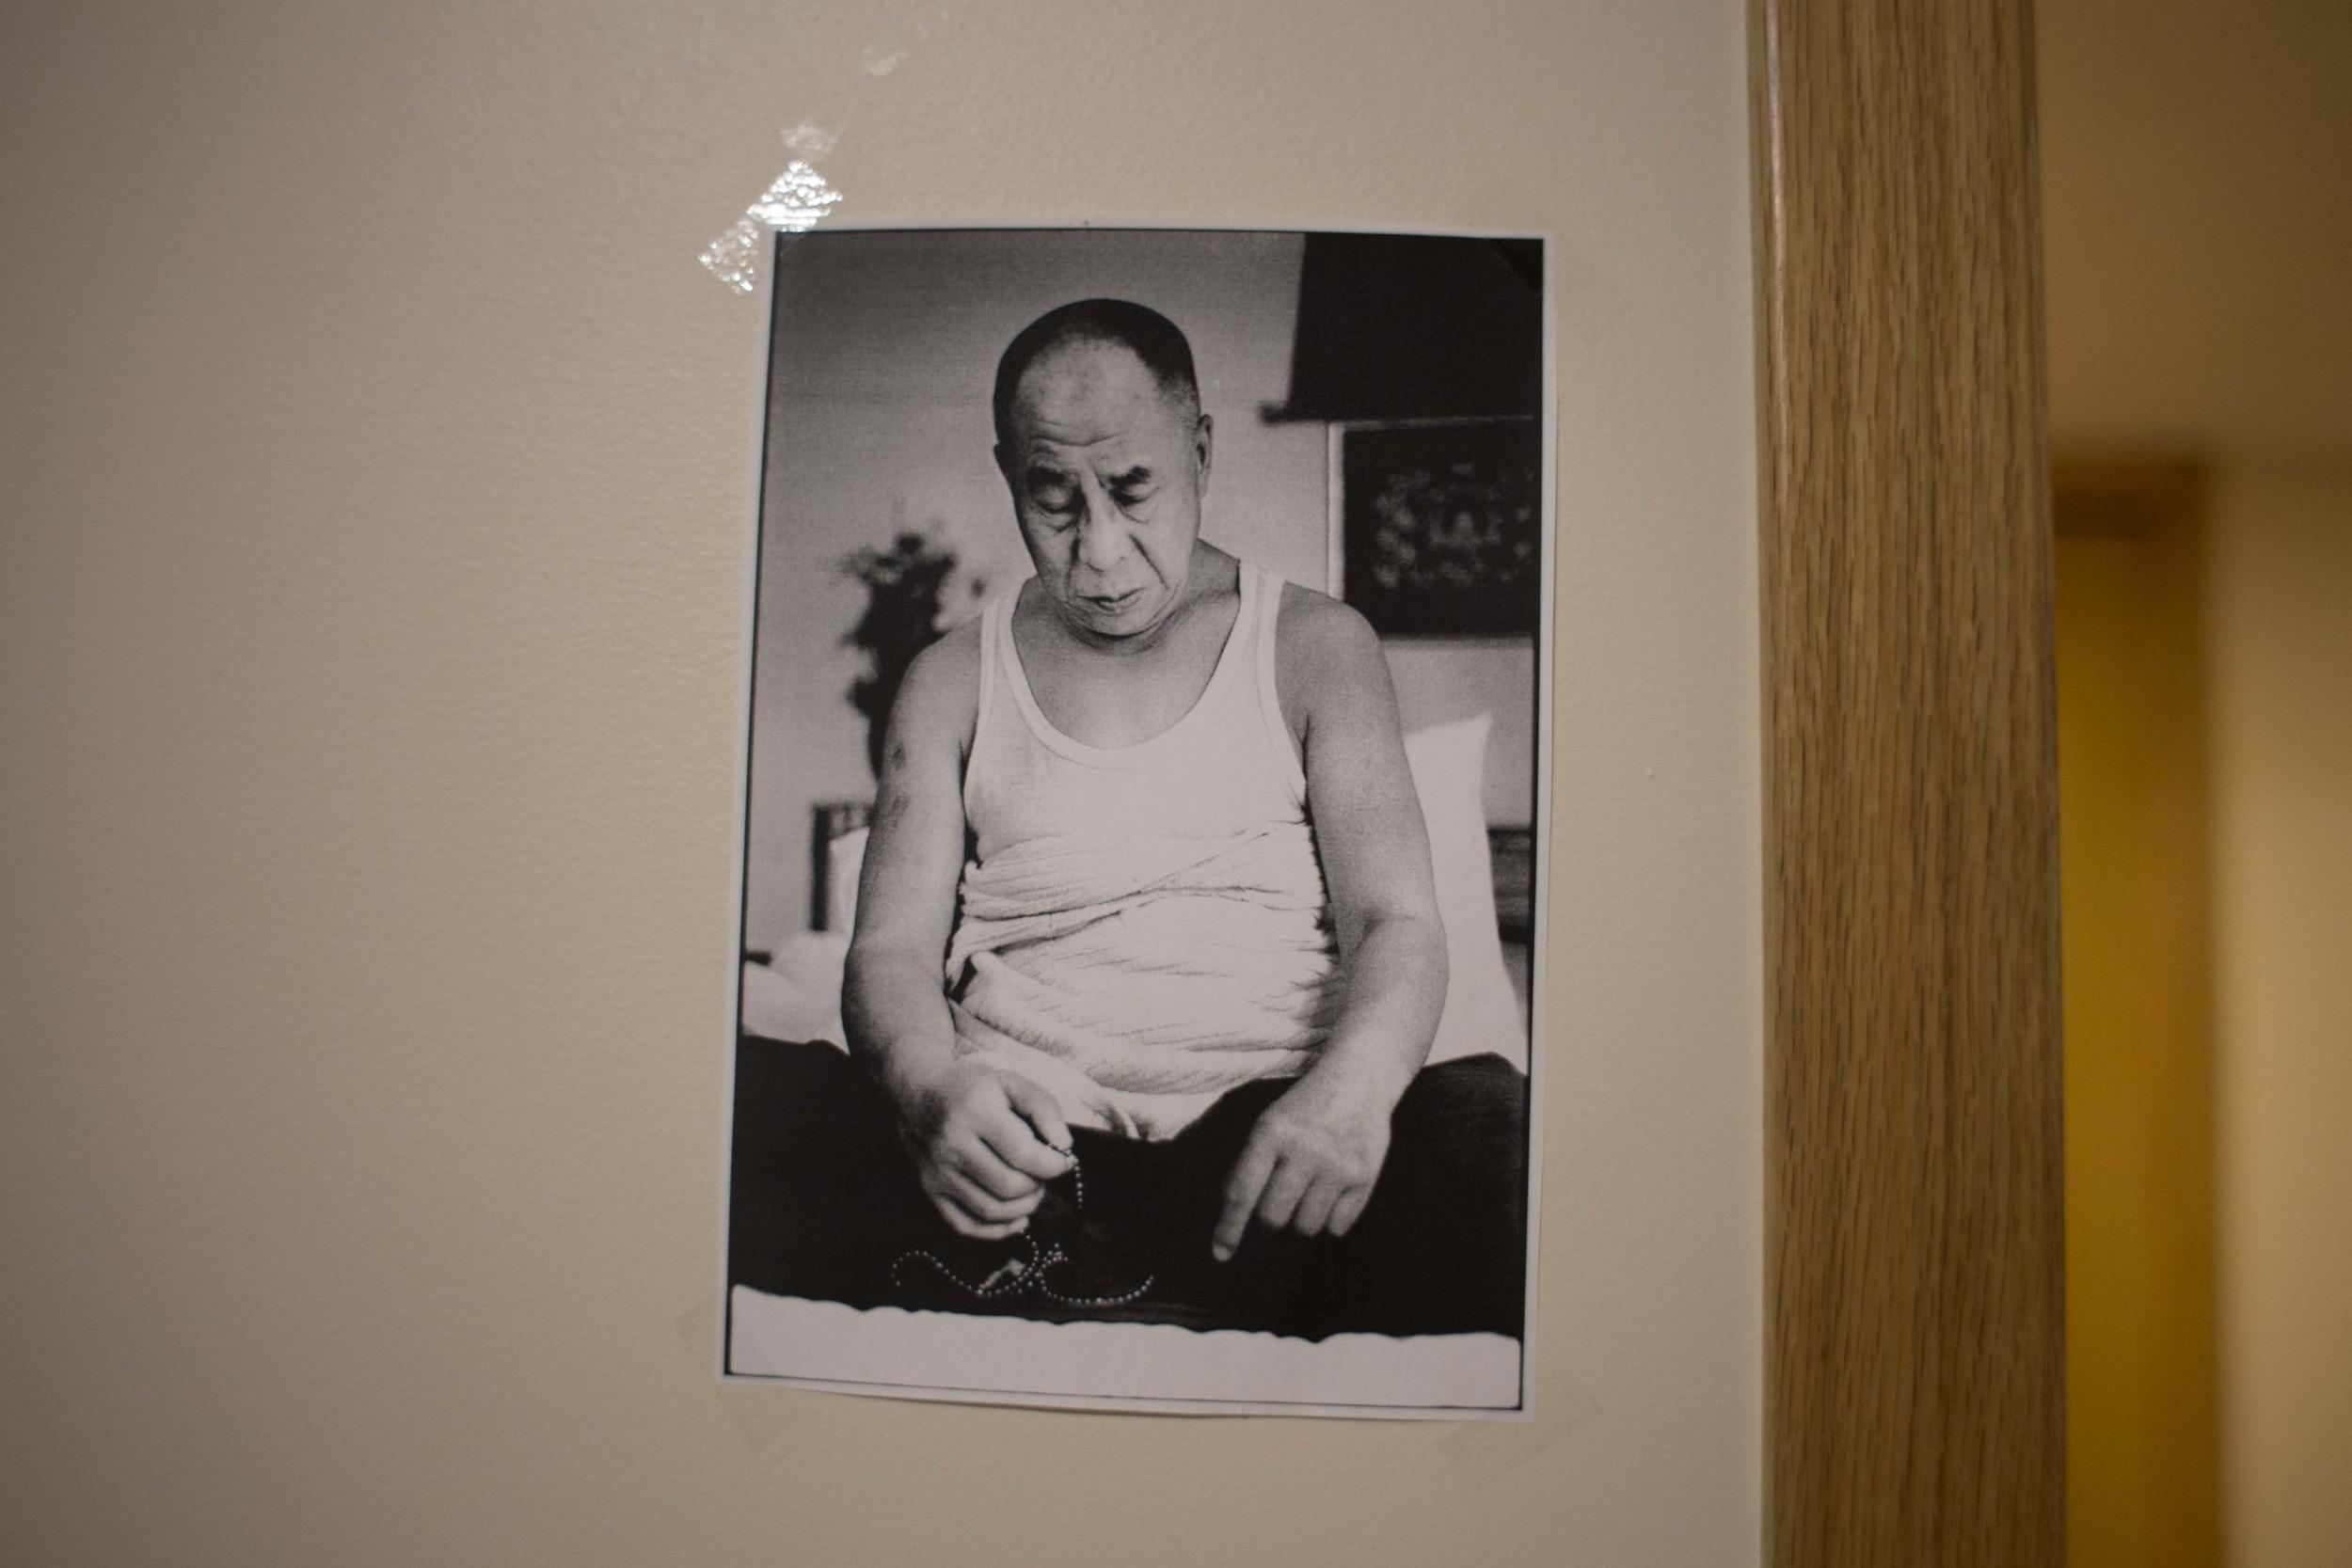 Buddhist image on bedroom wall